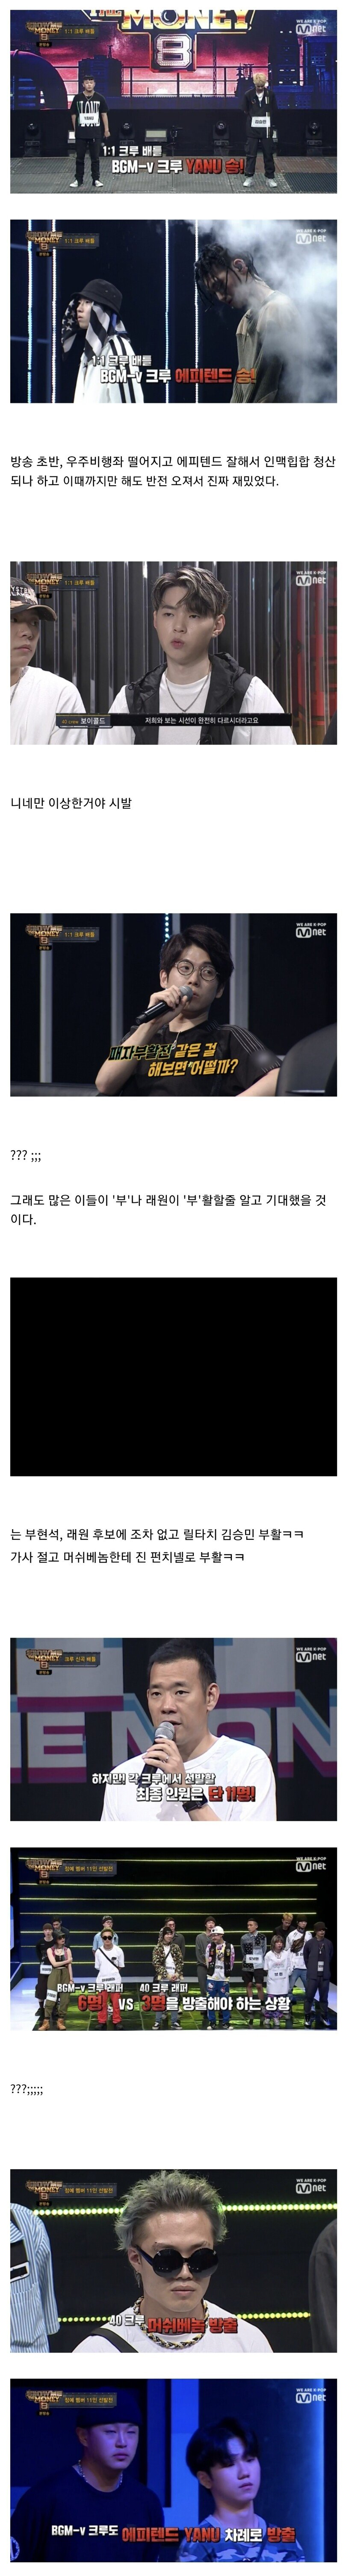 Screenshot_20190825-104011_Chrome.jpg (극혐) 쇼미더머니 8  근황